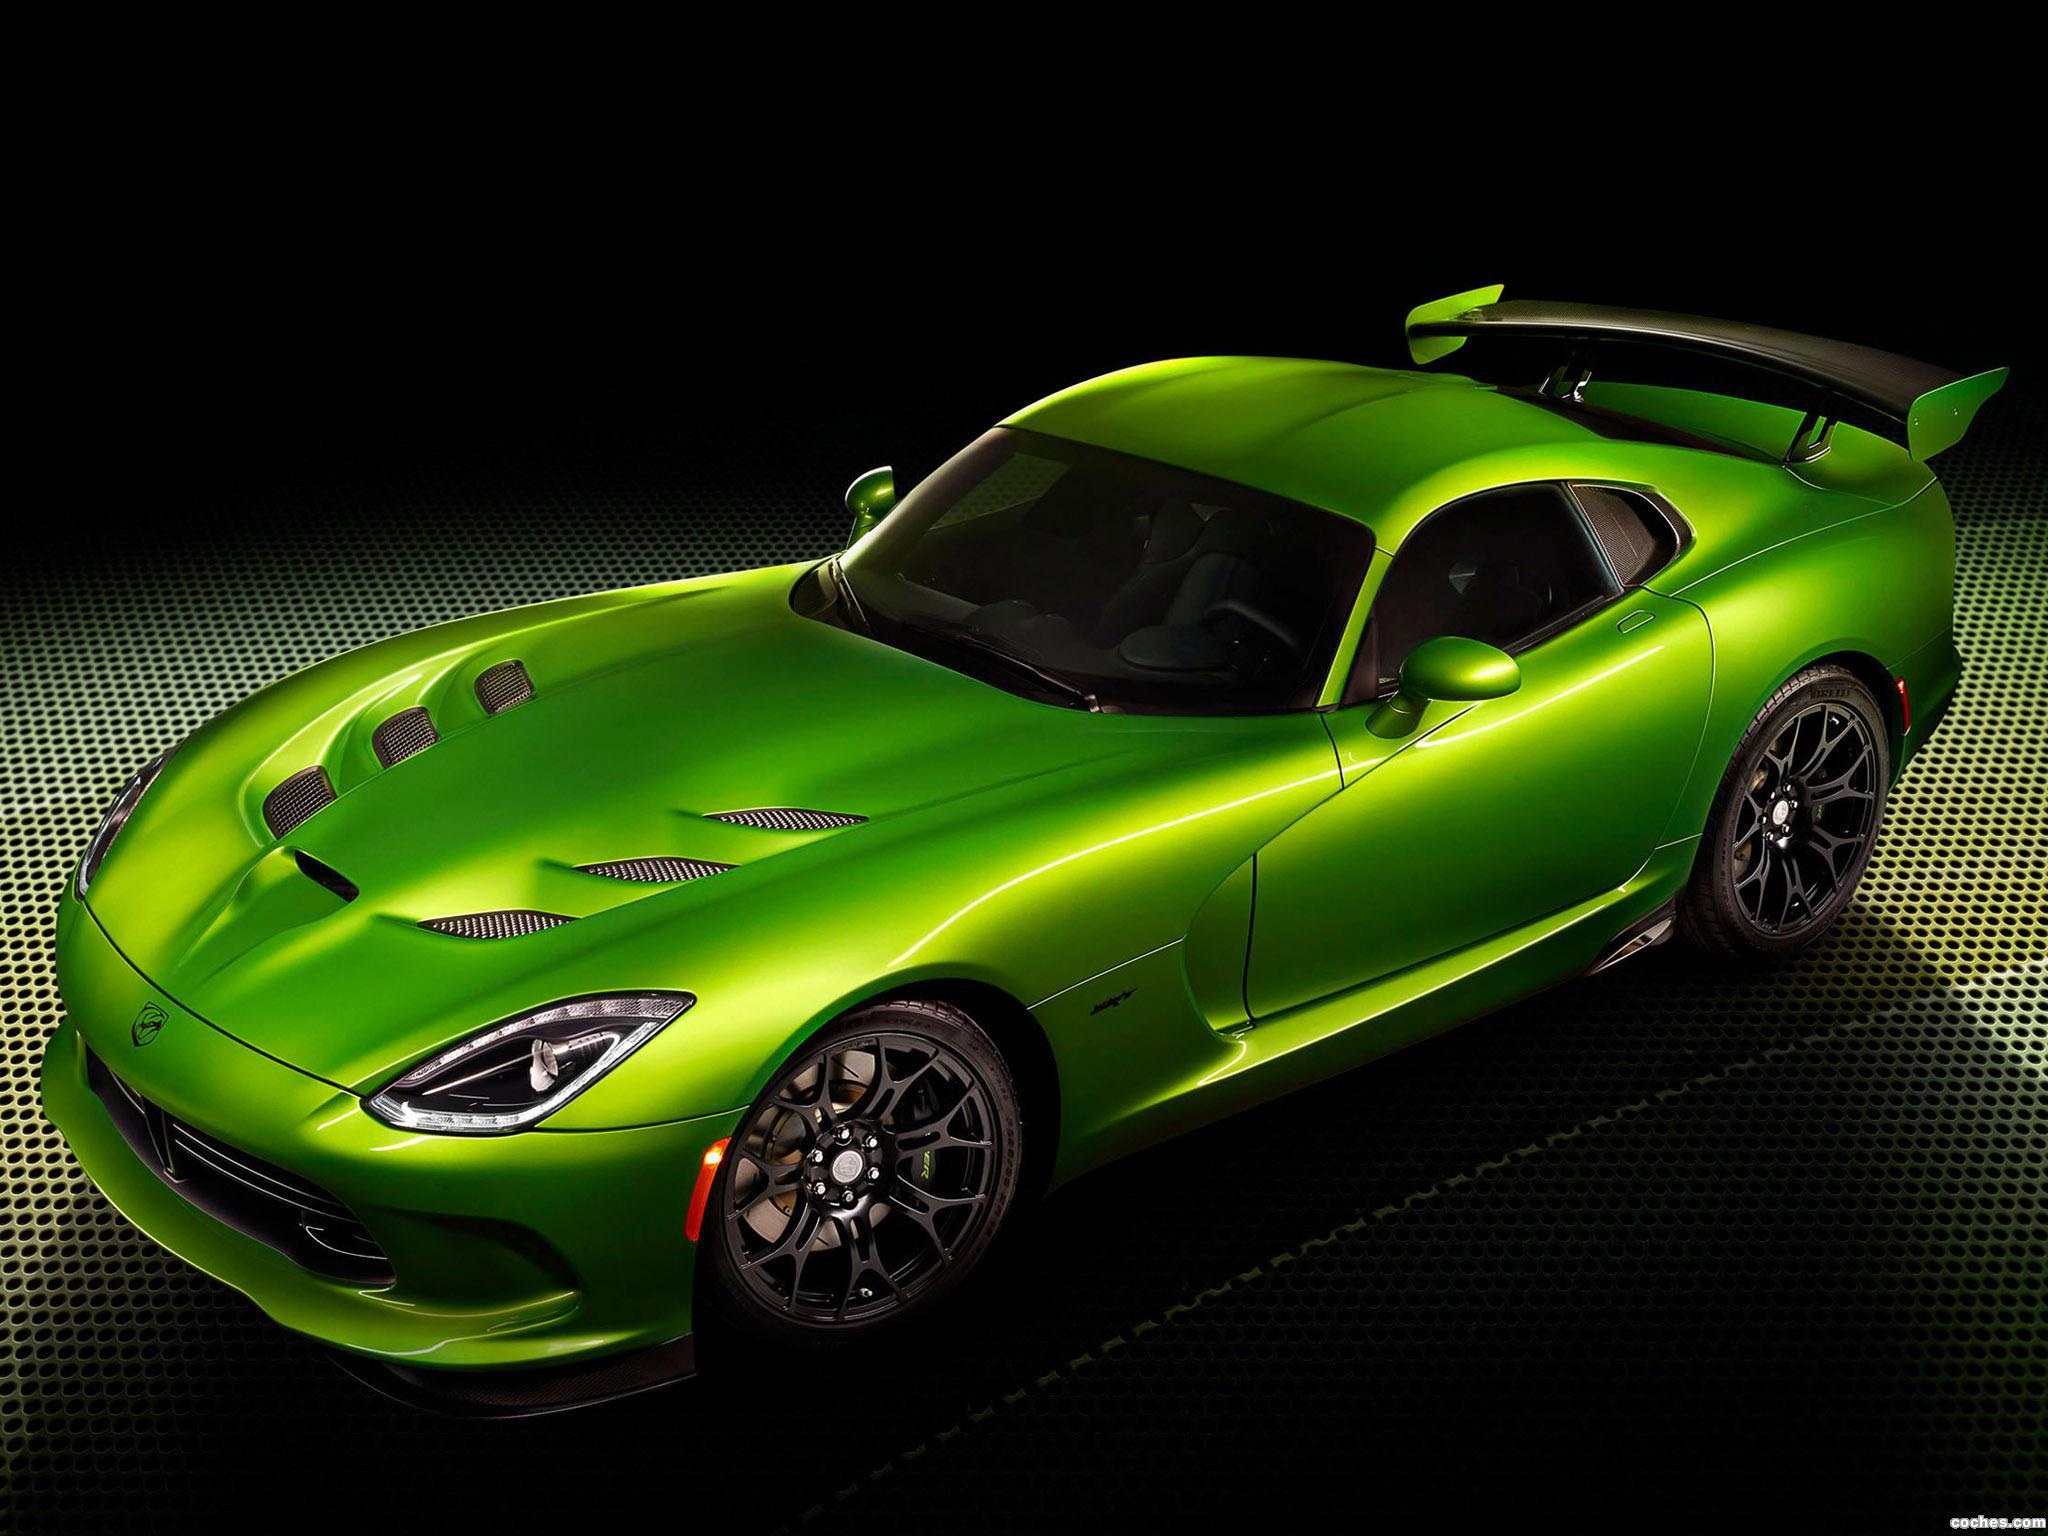 Foto 0 de Dodge SRT Viper GT Stryker Green 2014